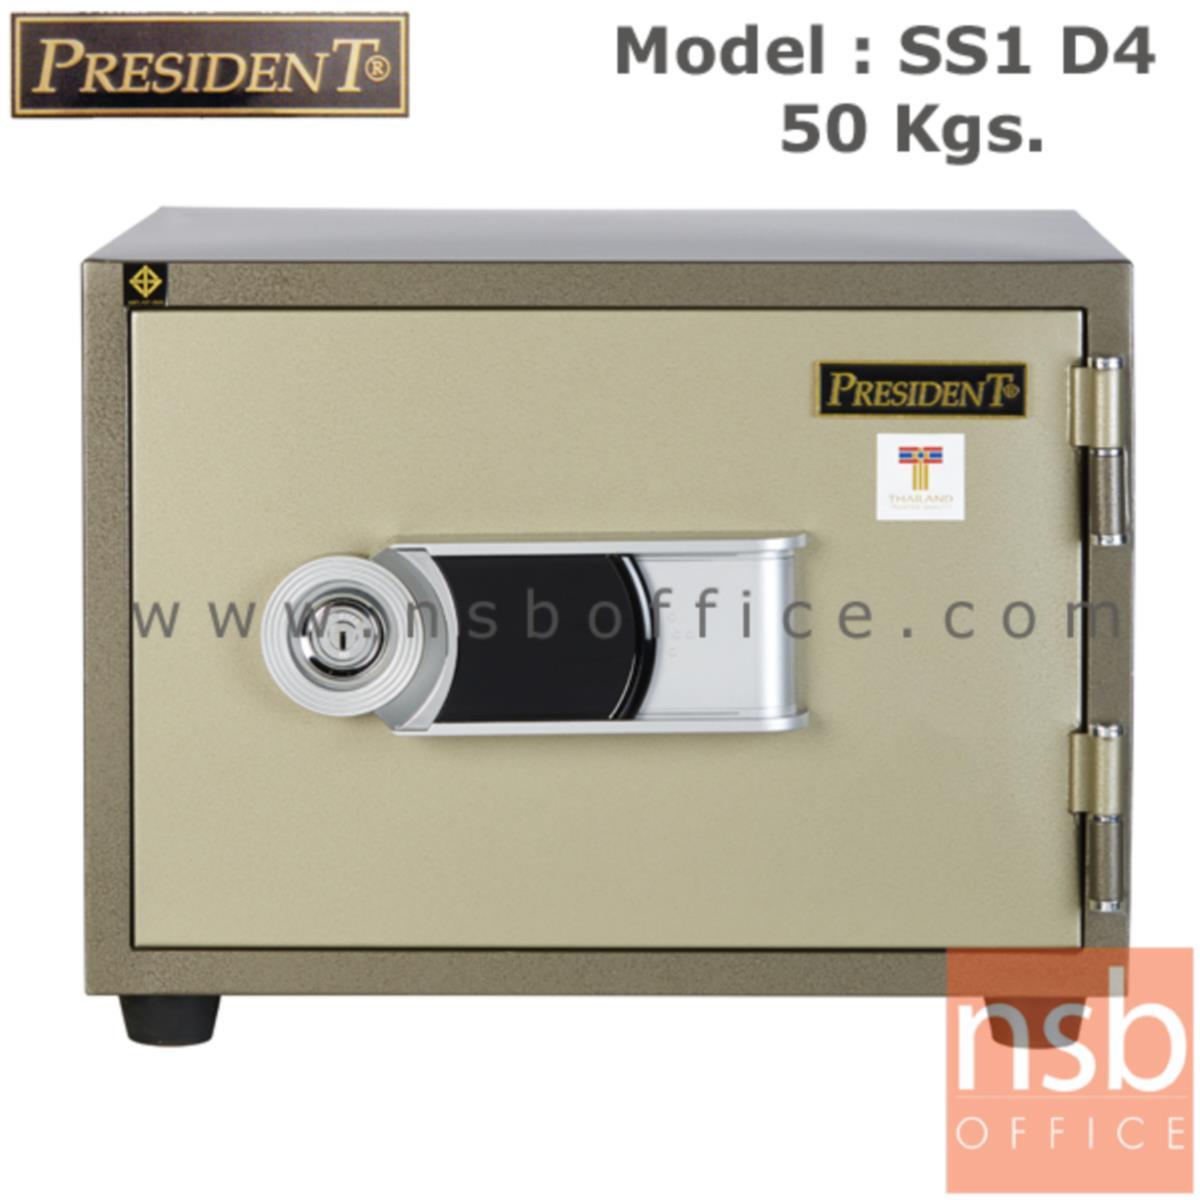 F05A070:ตู้เซฟนิรภัยชนิดดิจิตอลแบบใหม่ 50 กก.  รุ่น PRESIDENT-SS1D4   มี 1 กุญแจ 1 รหัส (รหัสใช้กดหน้าตู้)